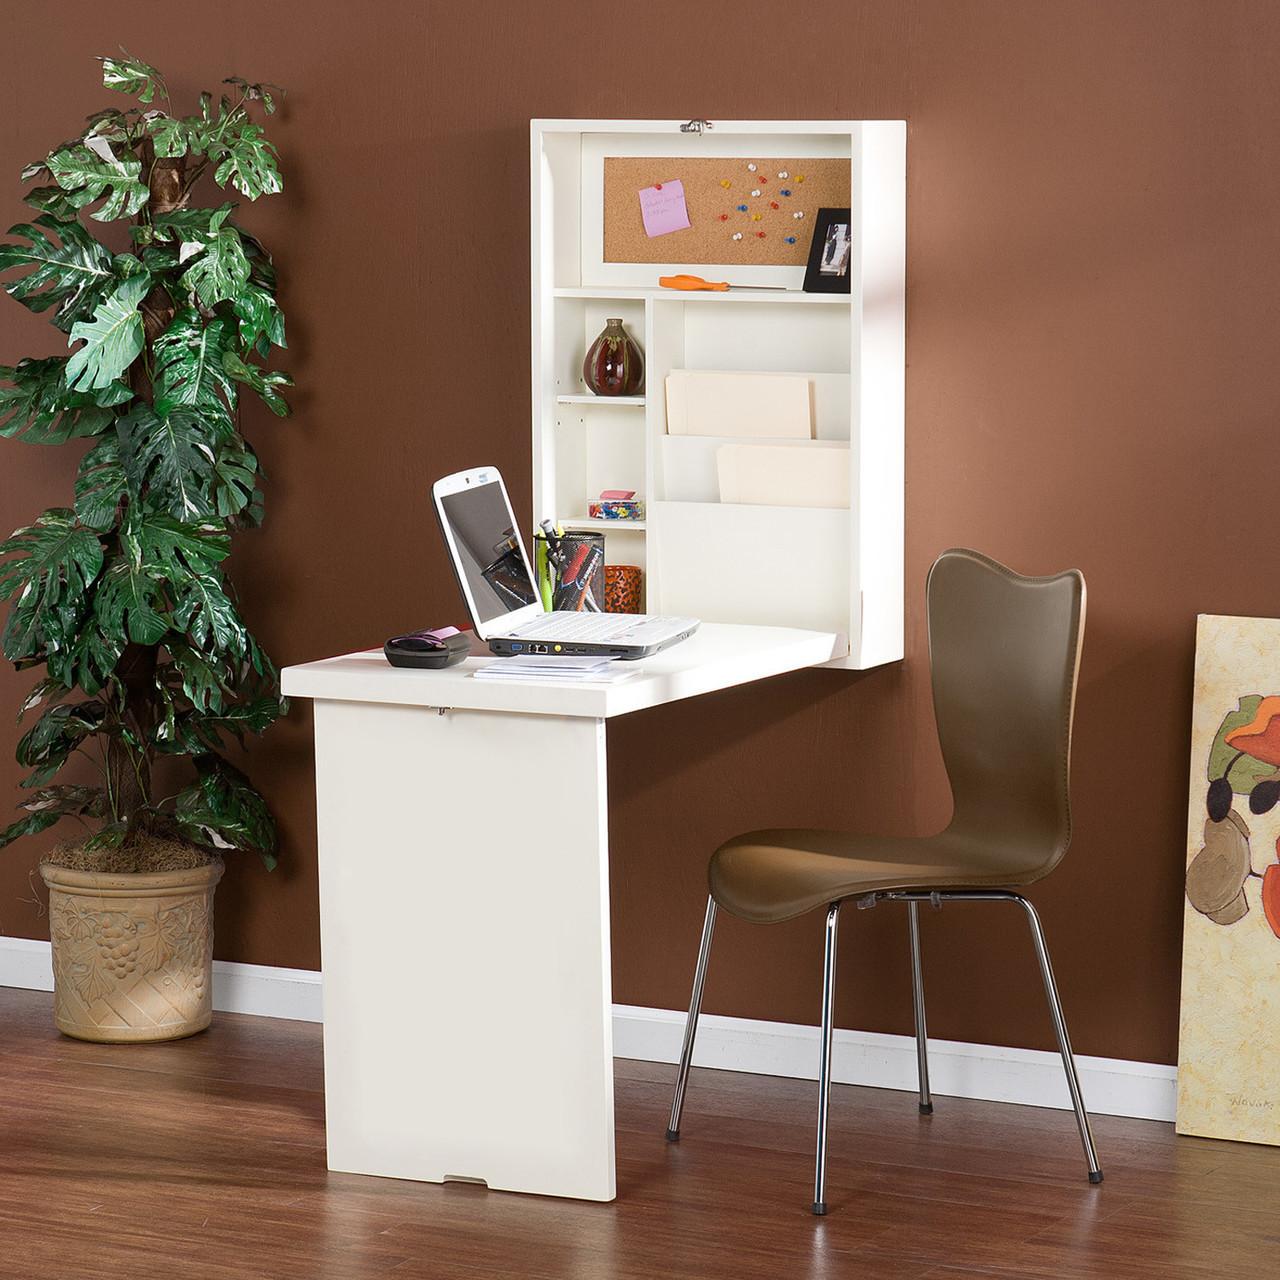 Wall Mount Fold Out Convertible Desk Computer Desk Laptop